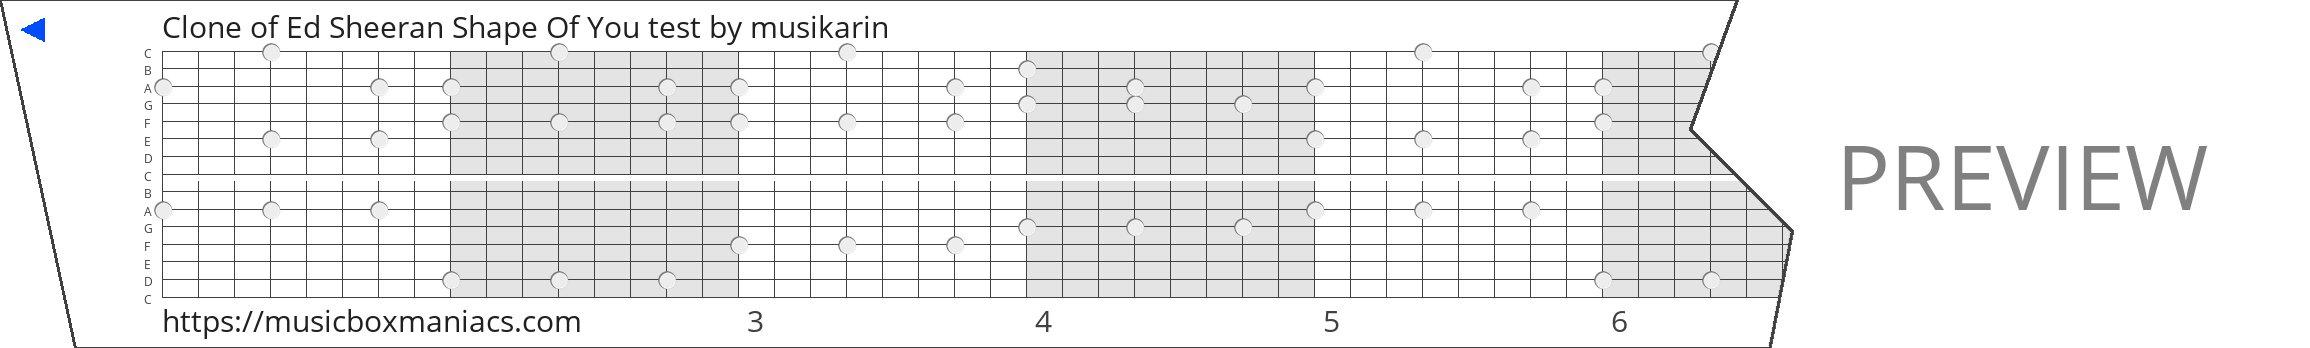 Clone of Ed Sheeran Shape Of You test 15 note music box paper strip